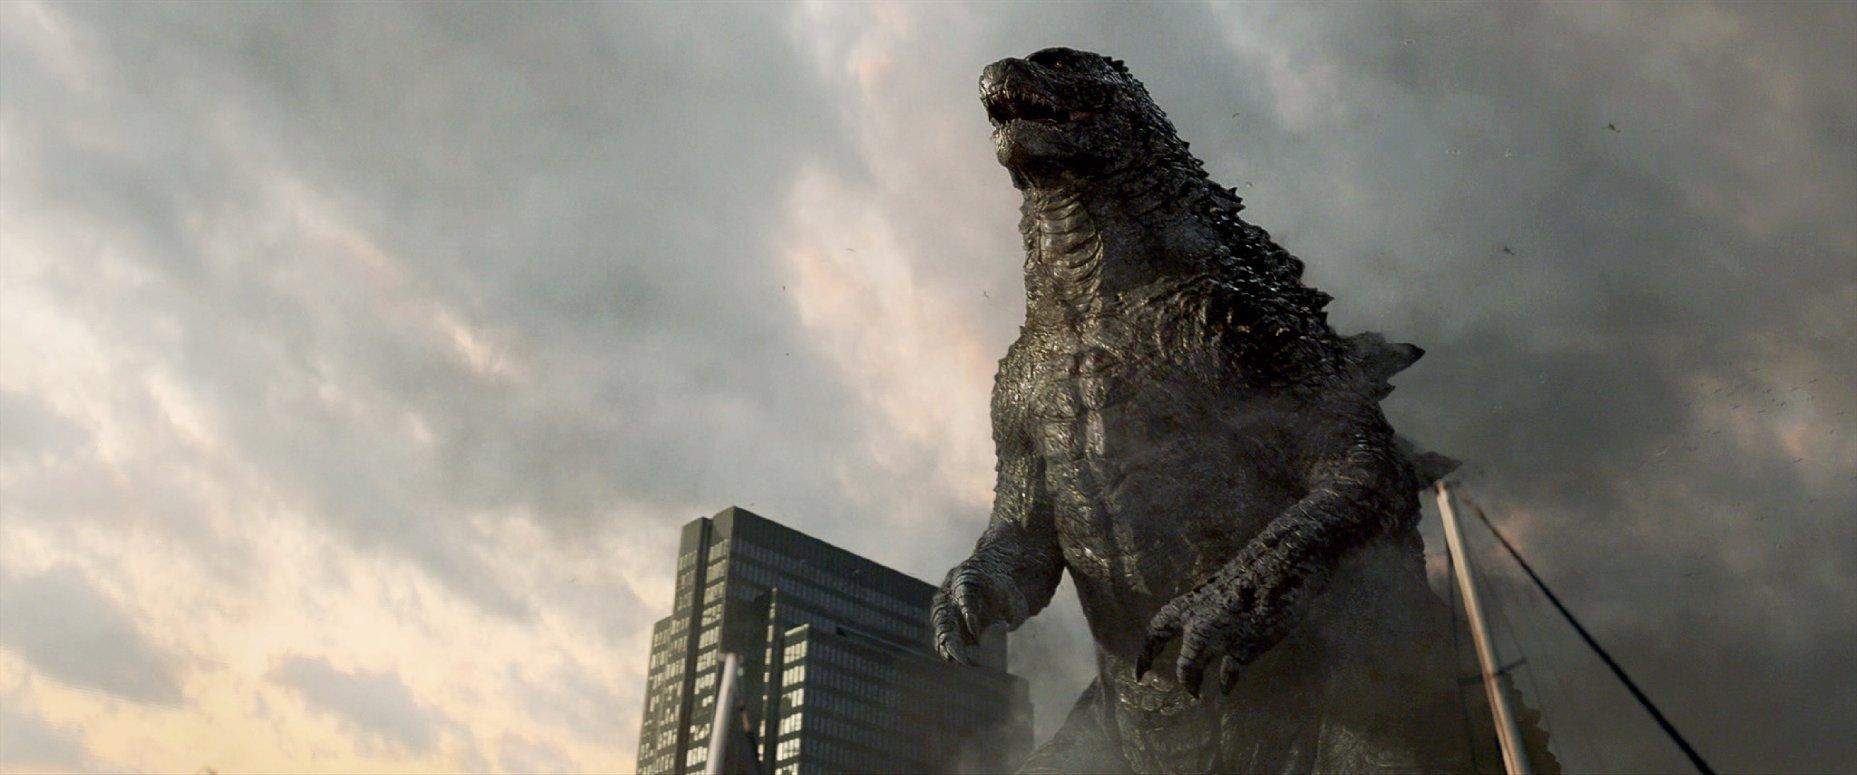 Godzilla gordo